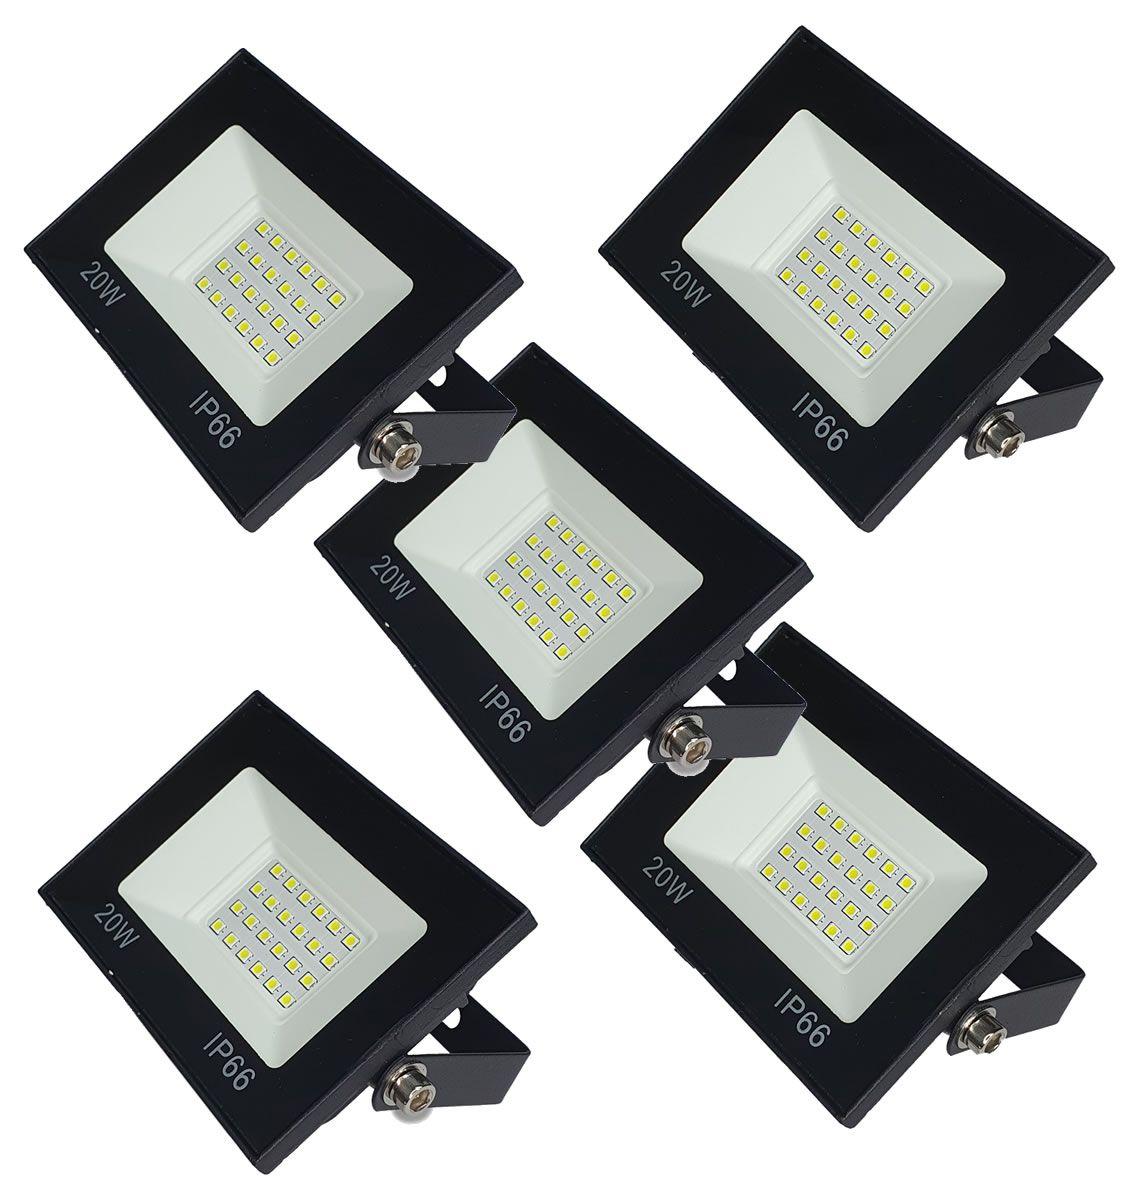 KIT 5 refletor 20w LED SMD Holofote Bivolt Externo Luz Branca